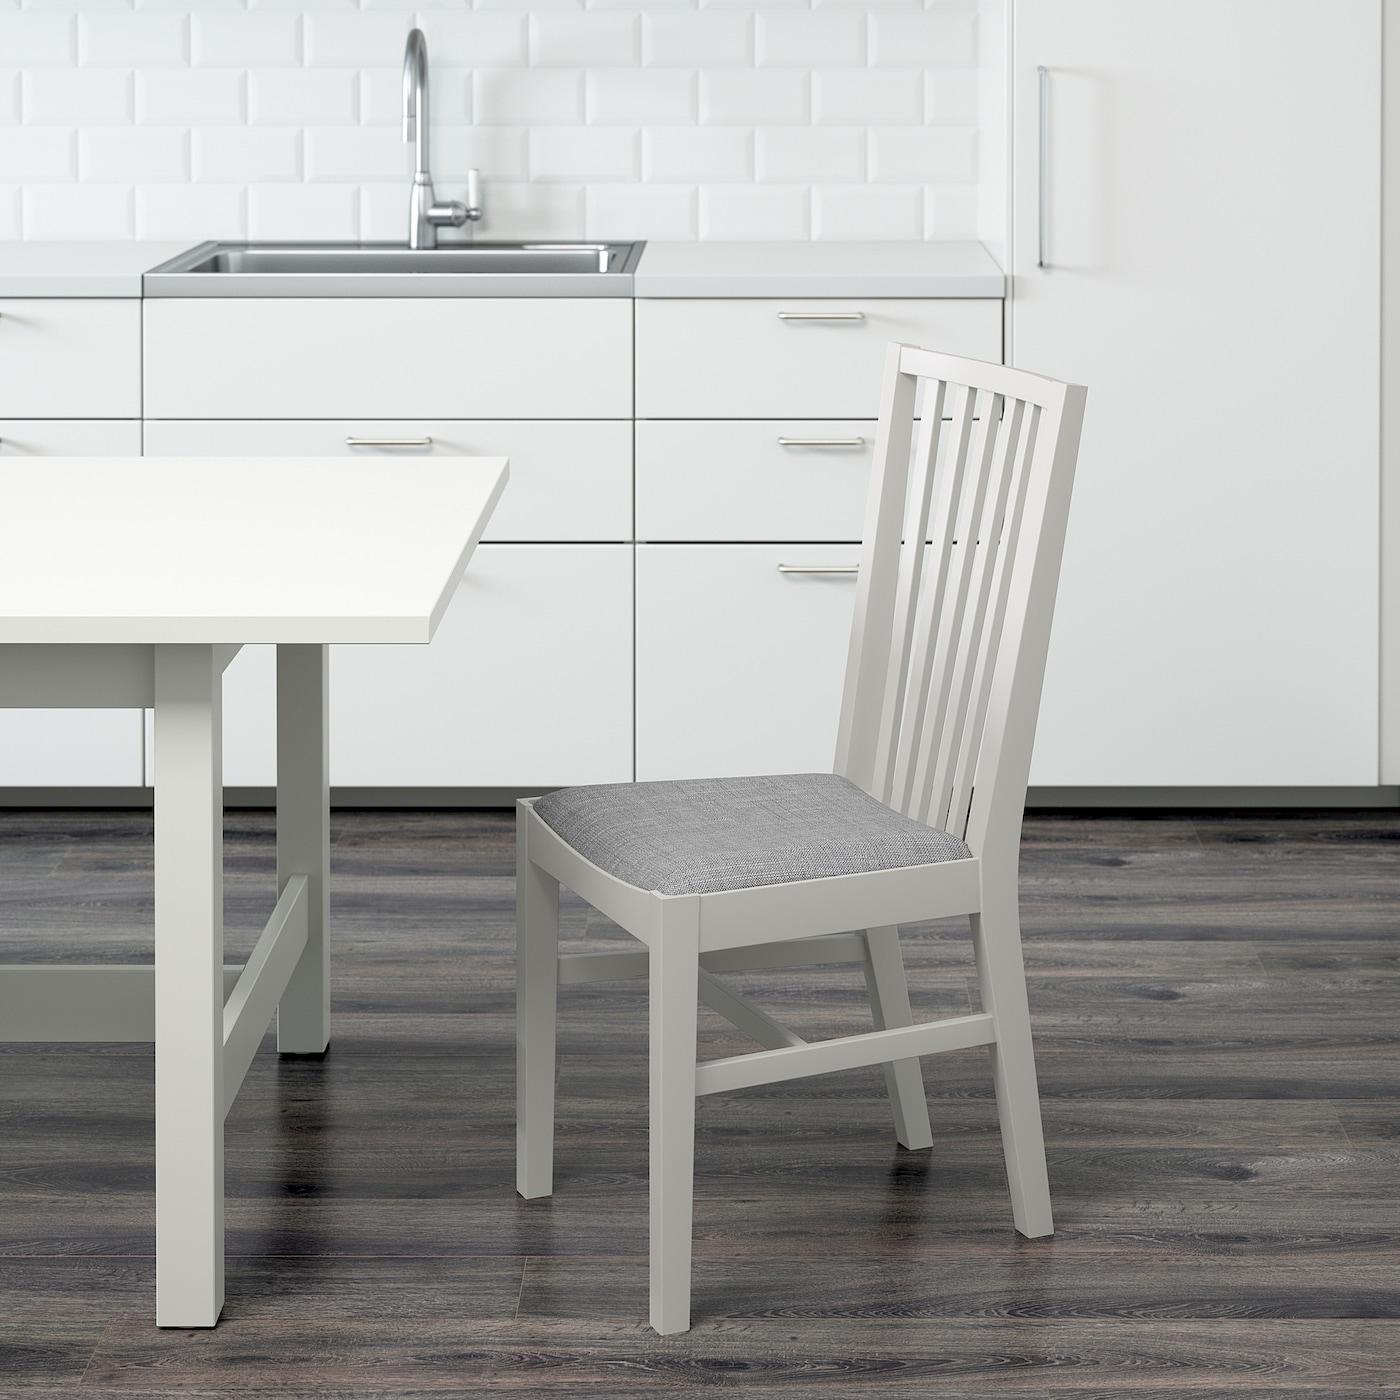 Norrnäs stol fra IKEA | FINN.no